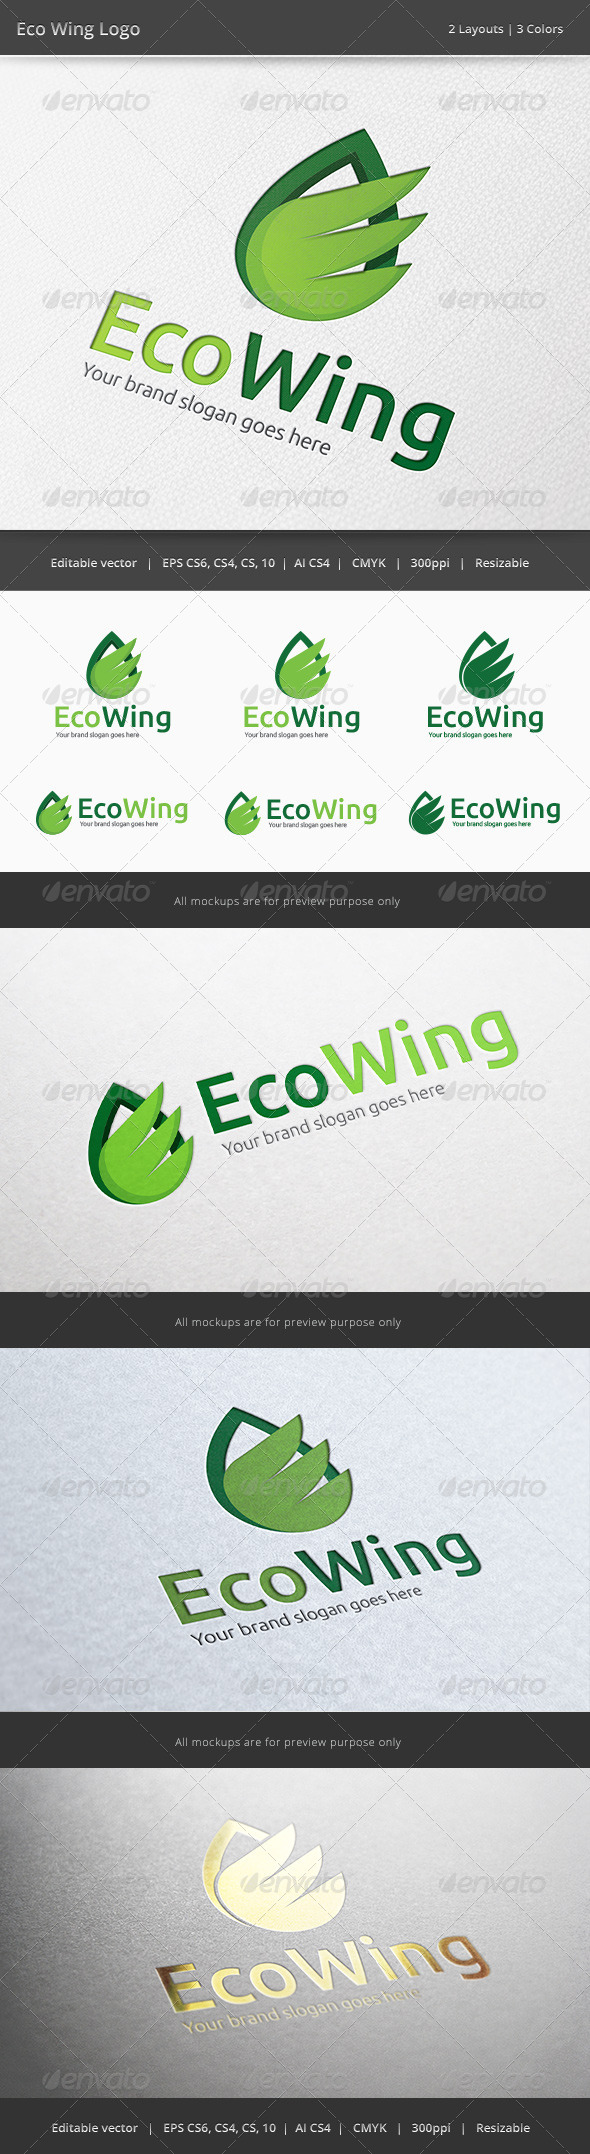 GraphicRiver Eco Wing Logo 6503349